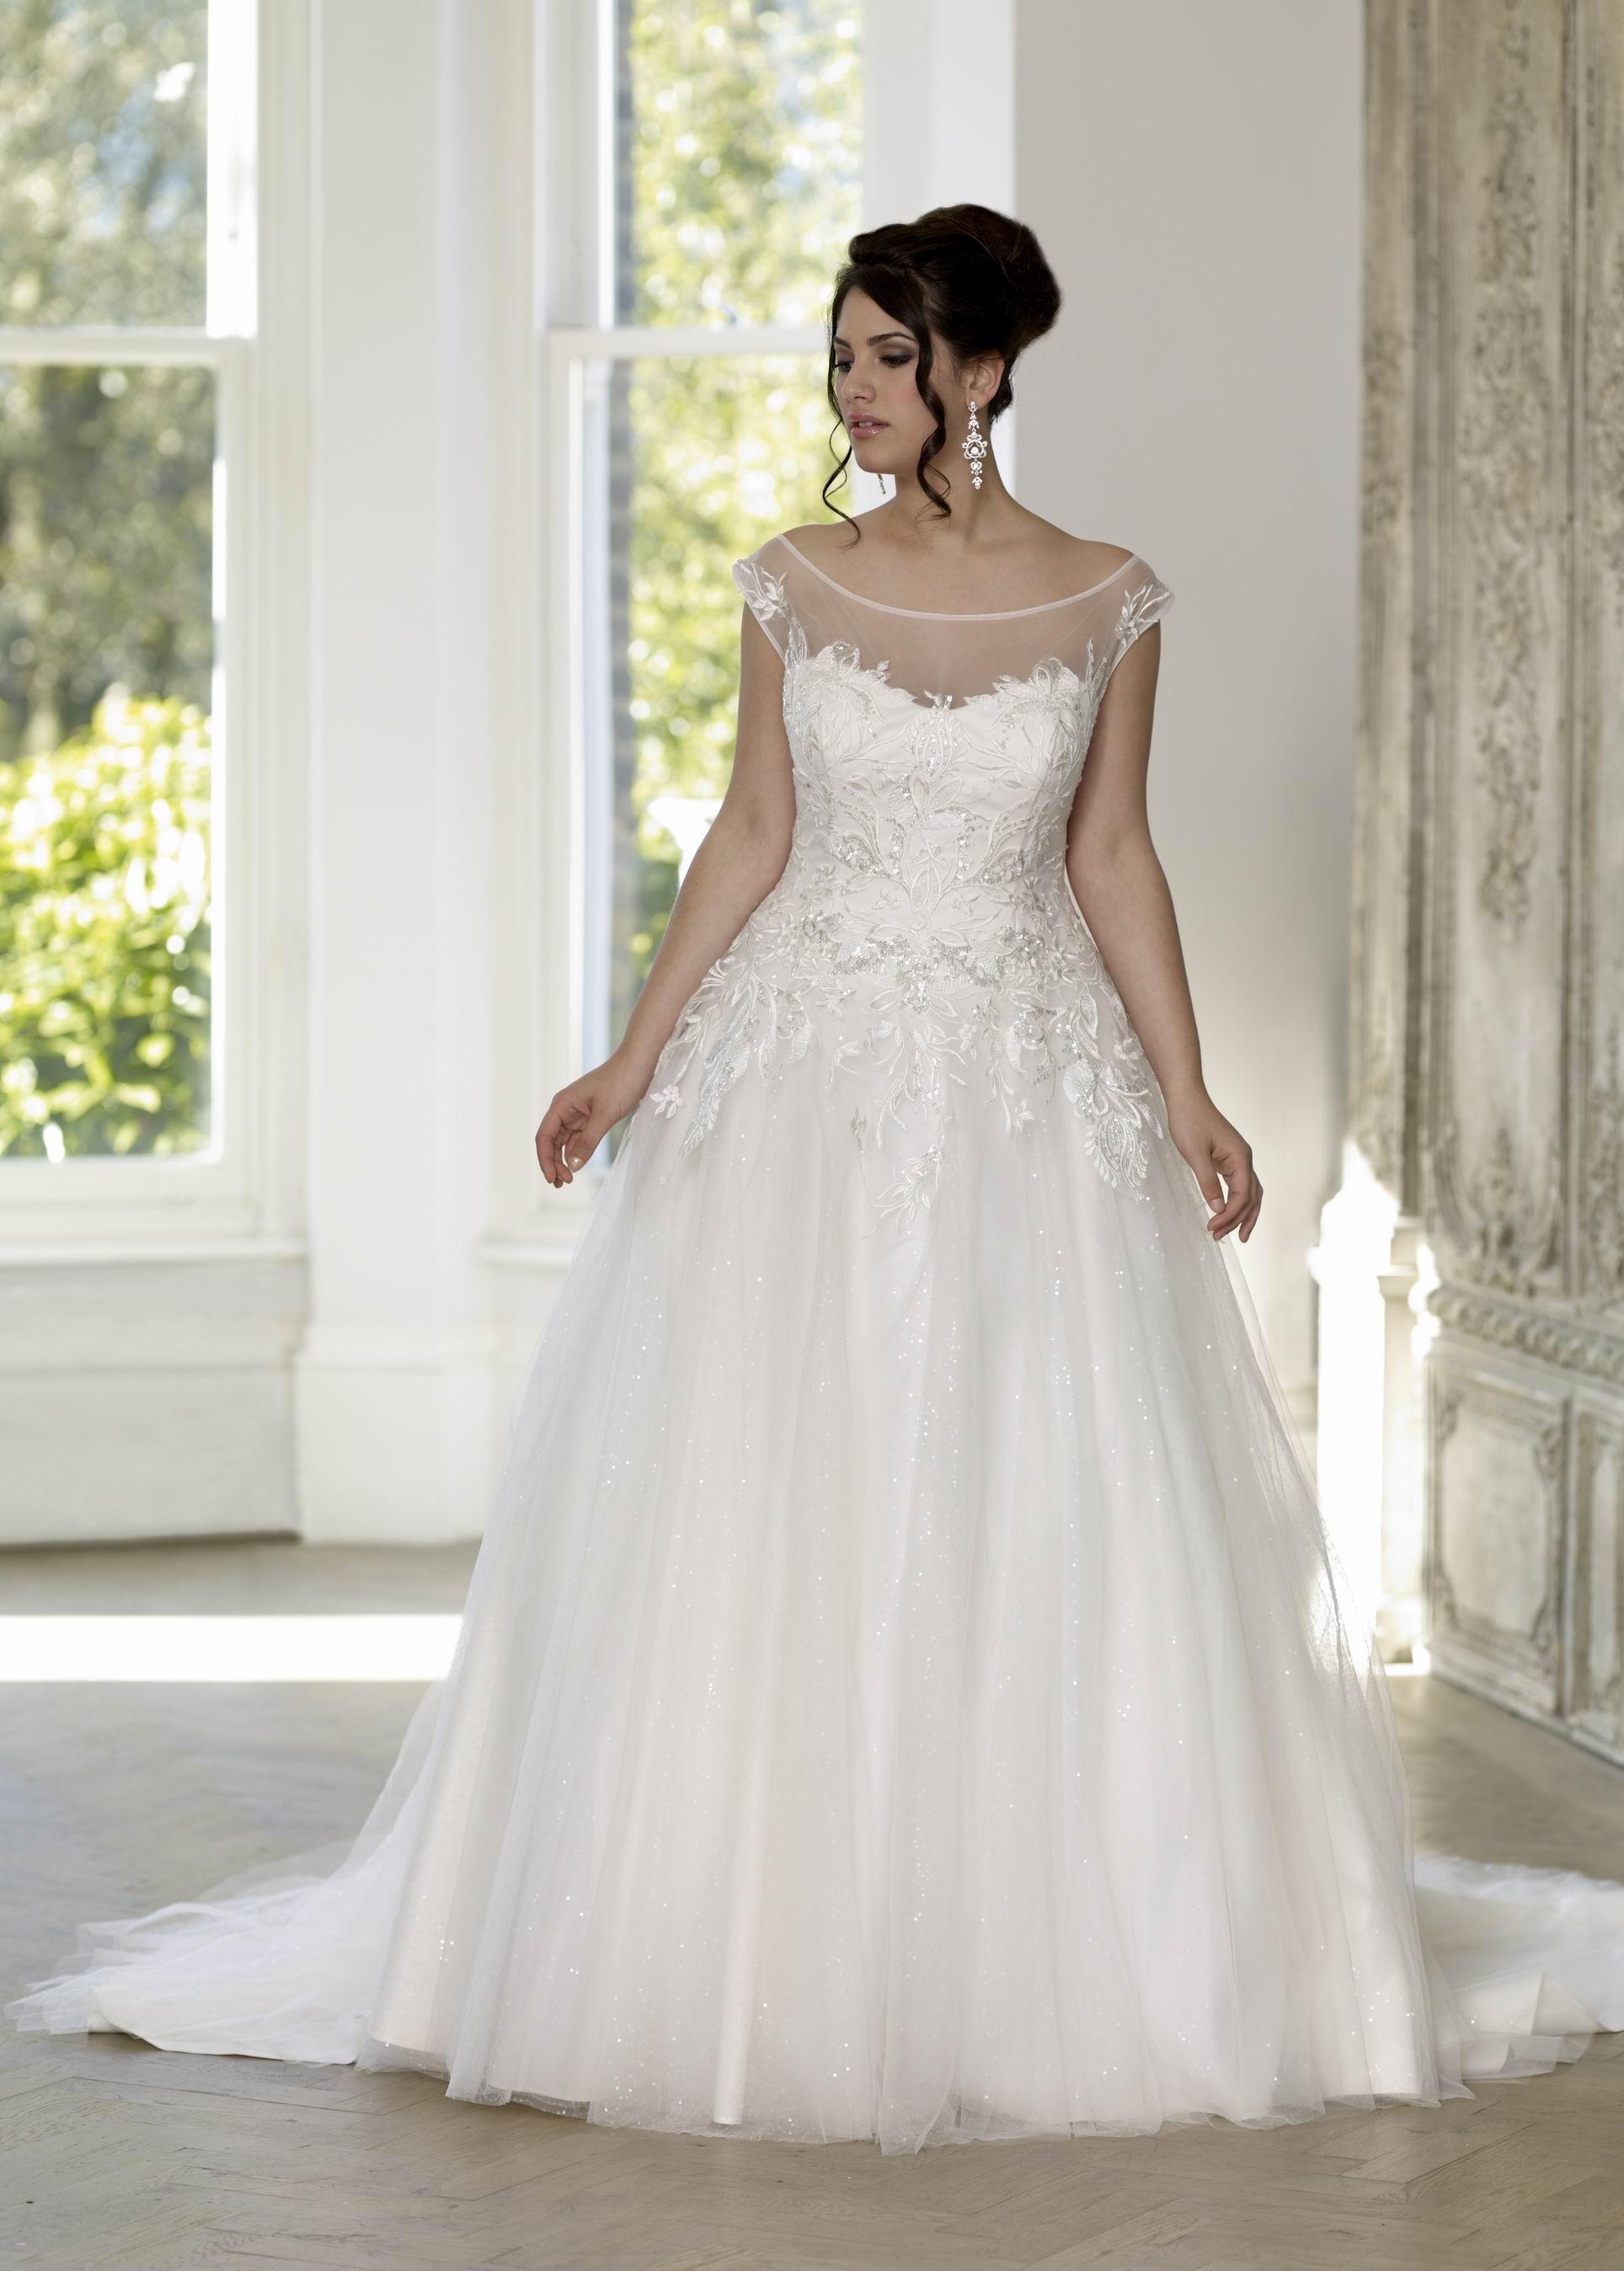 740e5022539e Sonsie | Just A Day Bridal